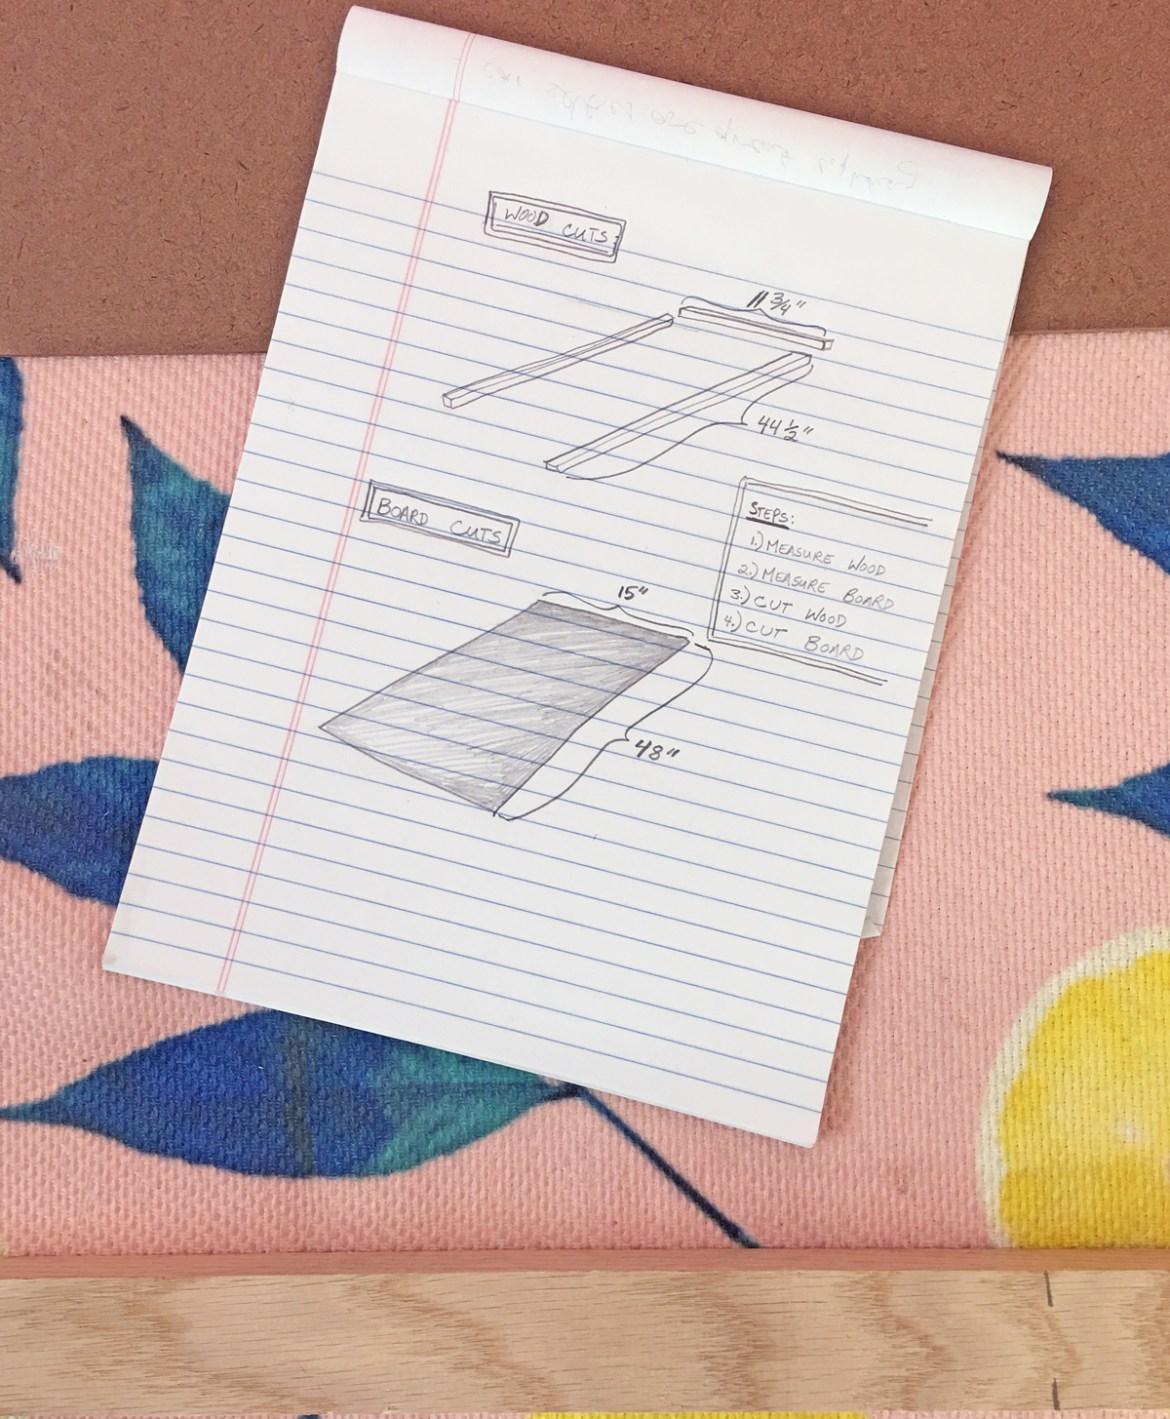 How to build a dog ramp tutorial - diagram